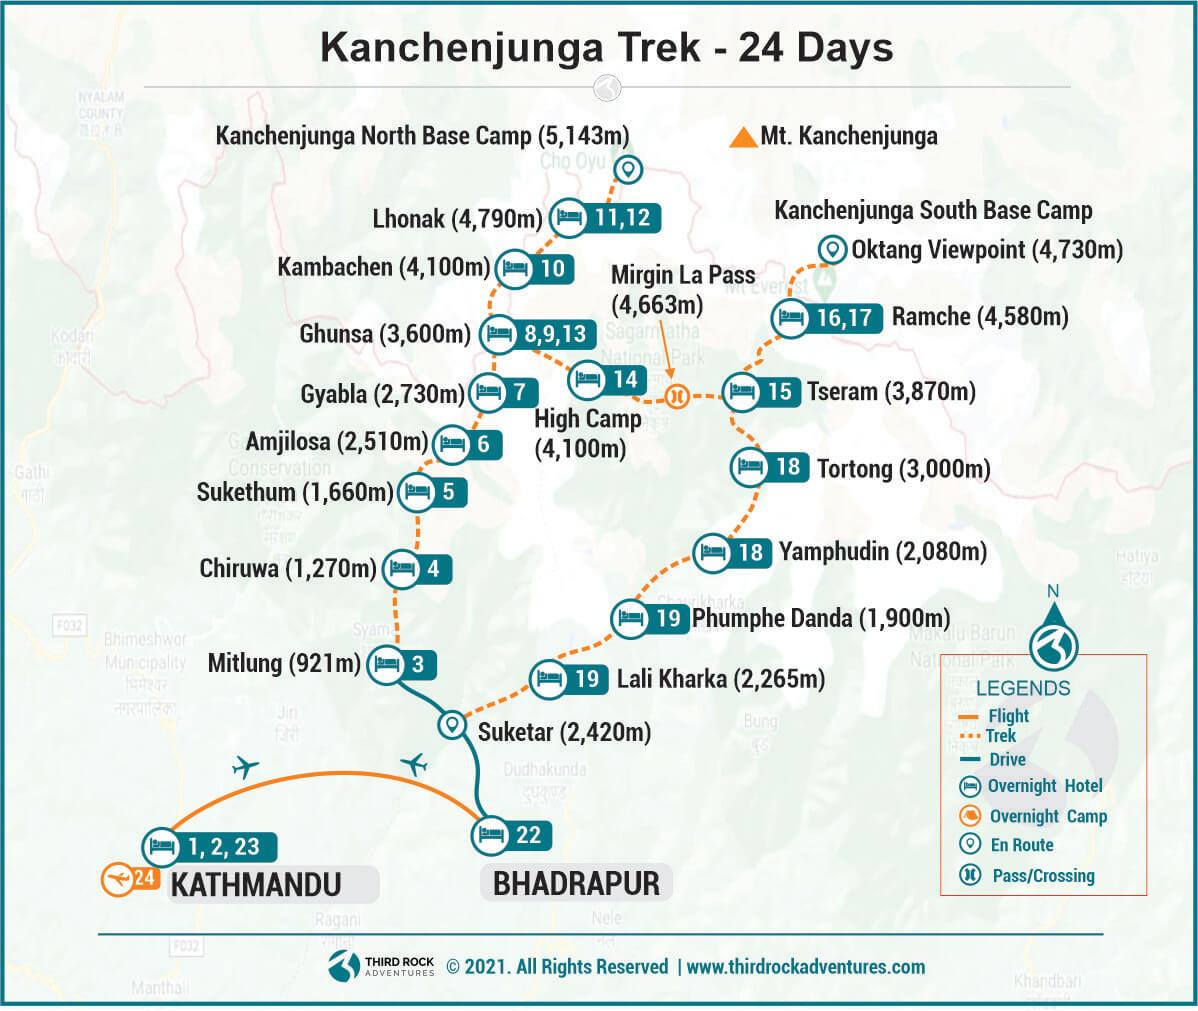 Kanchenjunga Trek Route Map